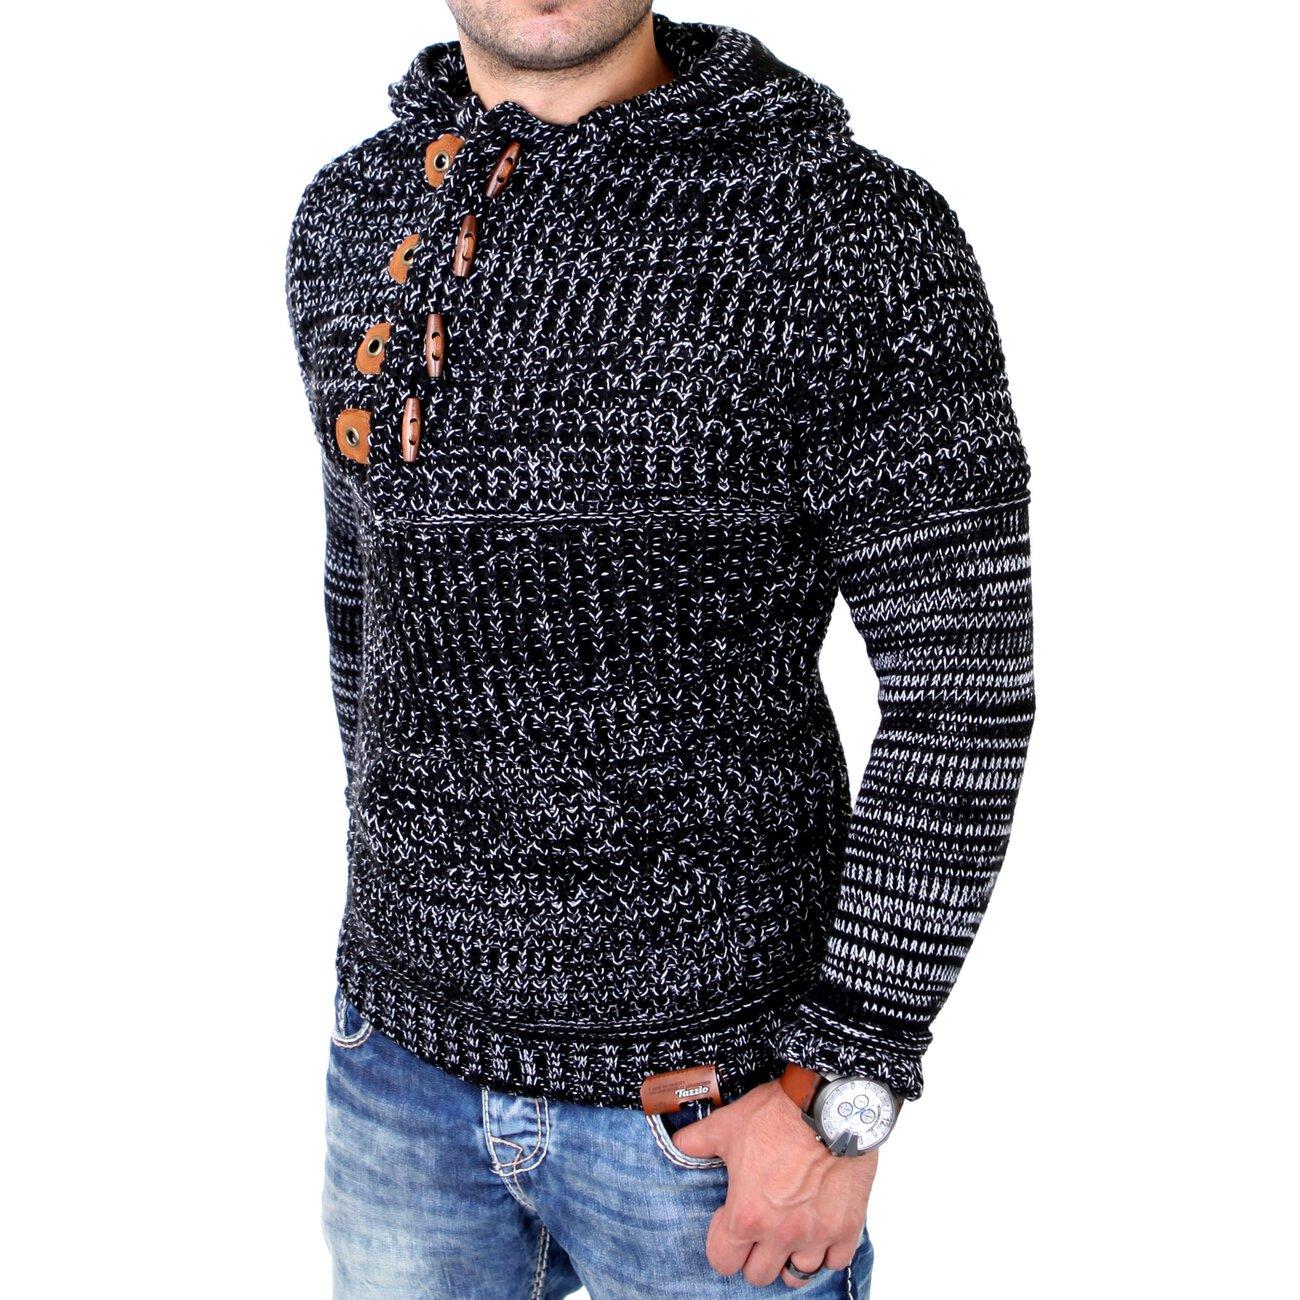 tazzio strickpullover melierter winter pullover mit kapuze. Black Bedroom Furniture Sets. Home Design Ideas